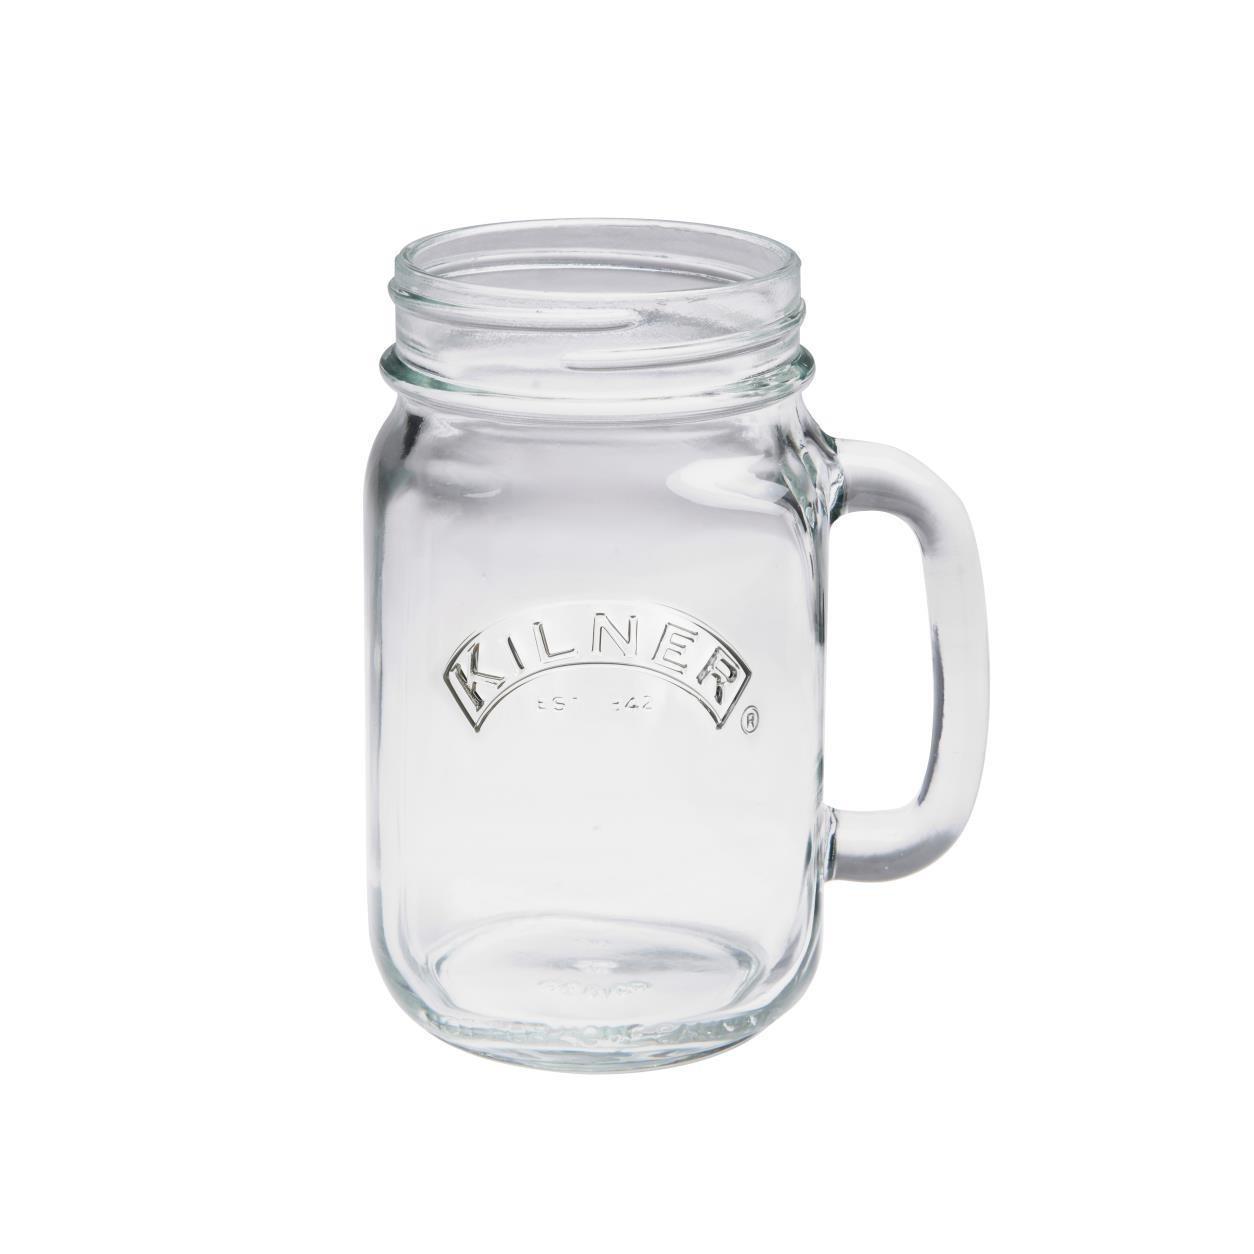 0.4ltr Kilner Clear Handled Drinking Jar